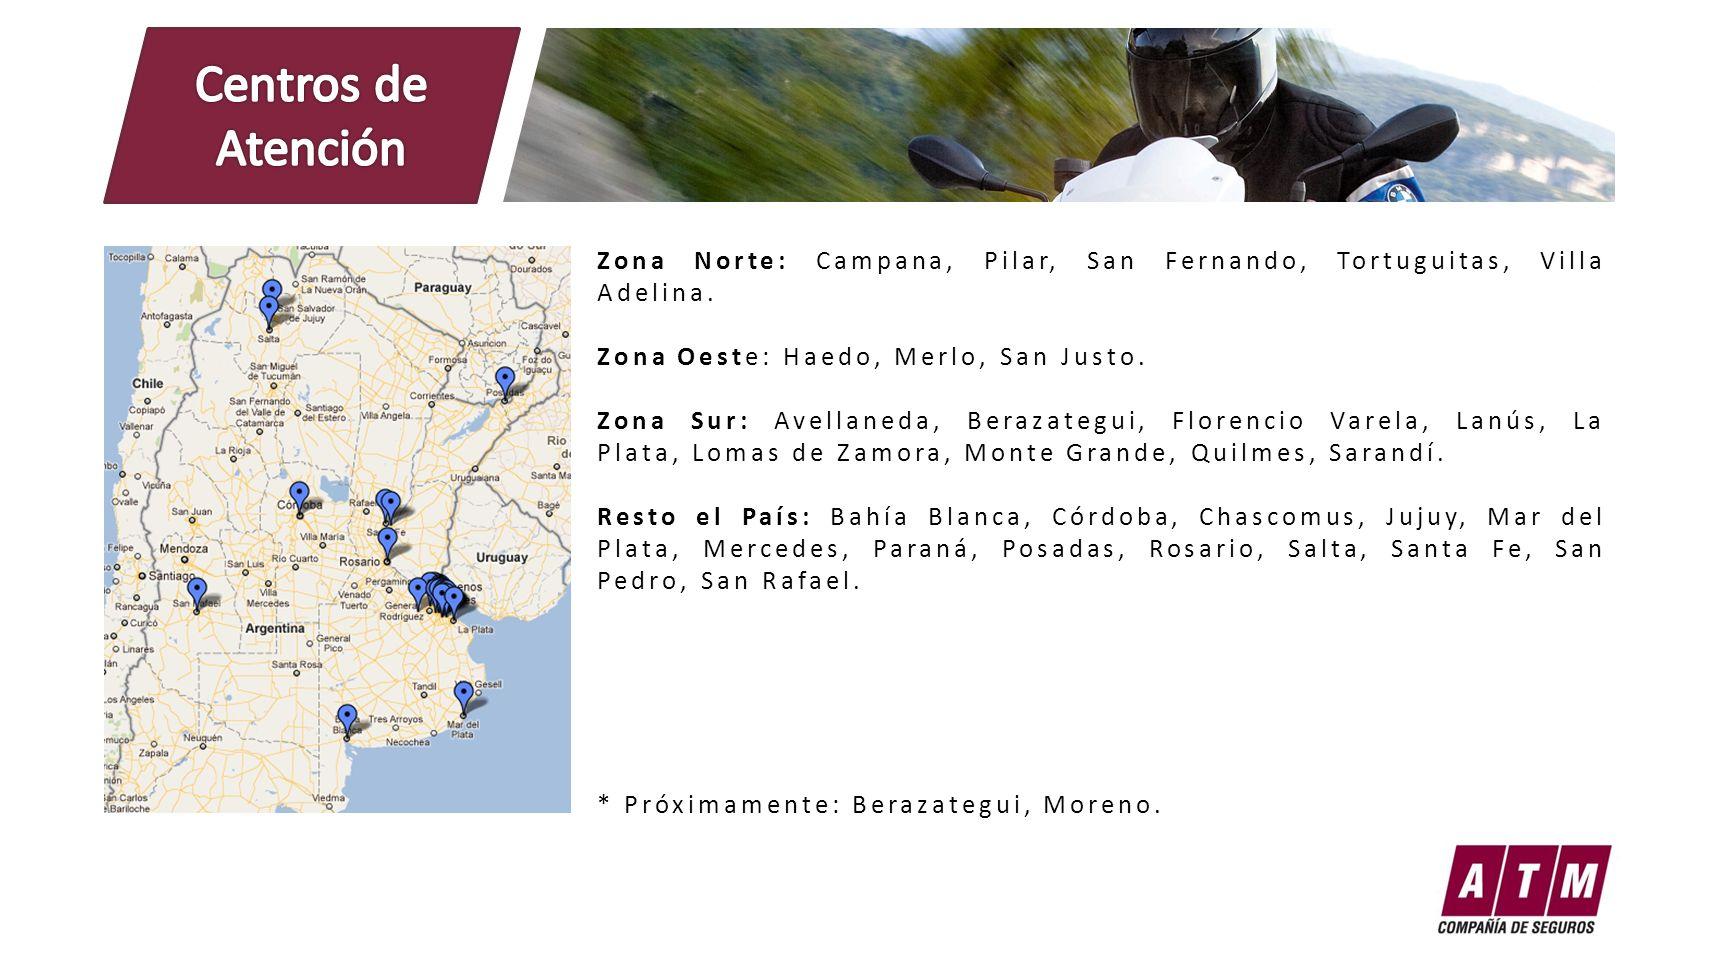 Centros de Atención Zona Norte: Campana, Pilar, San Fernando, Tortuguitas, Villa Adelina. Zona Oeste: Haedo, Merlo, San Justo.